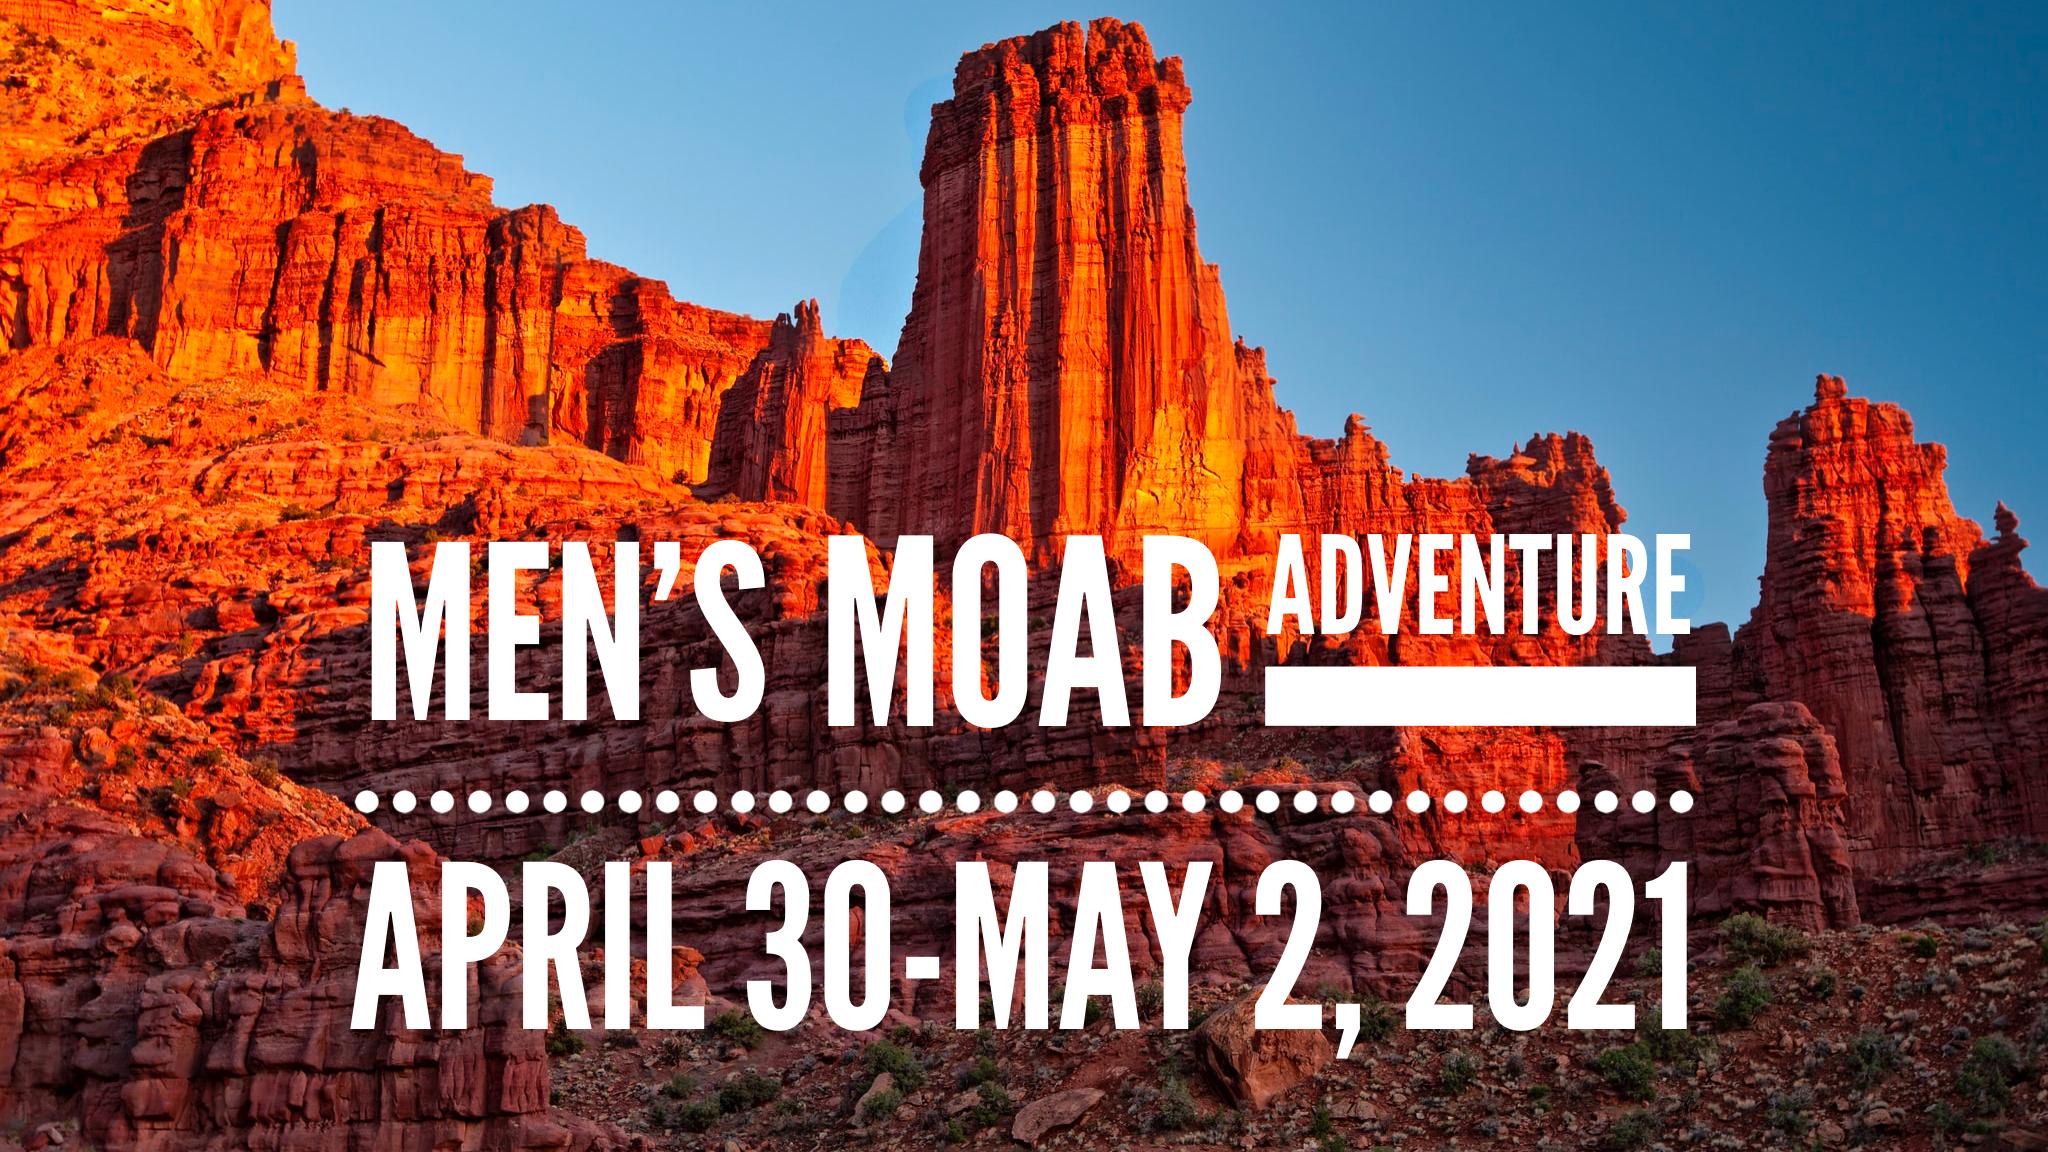 Men's Moab Adventure